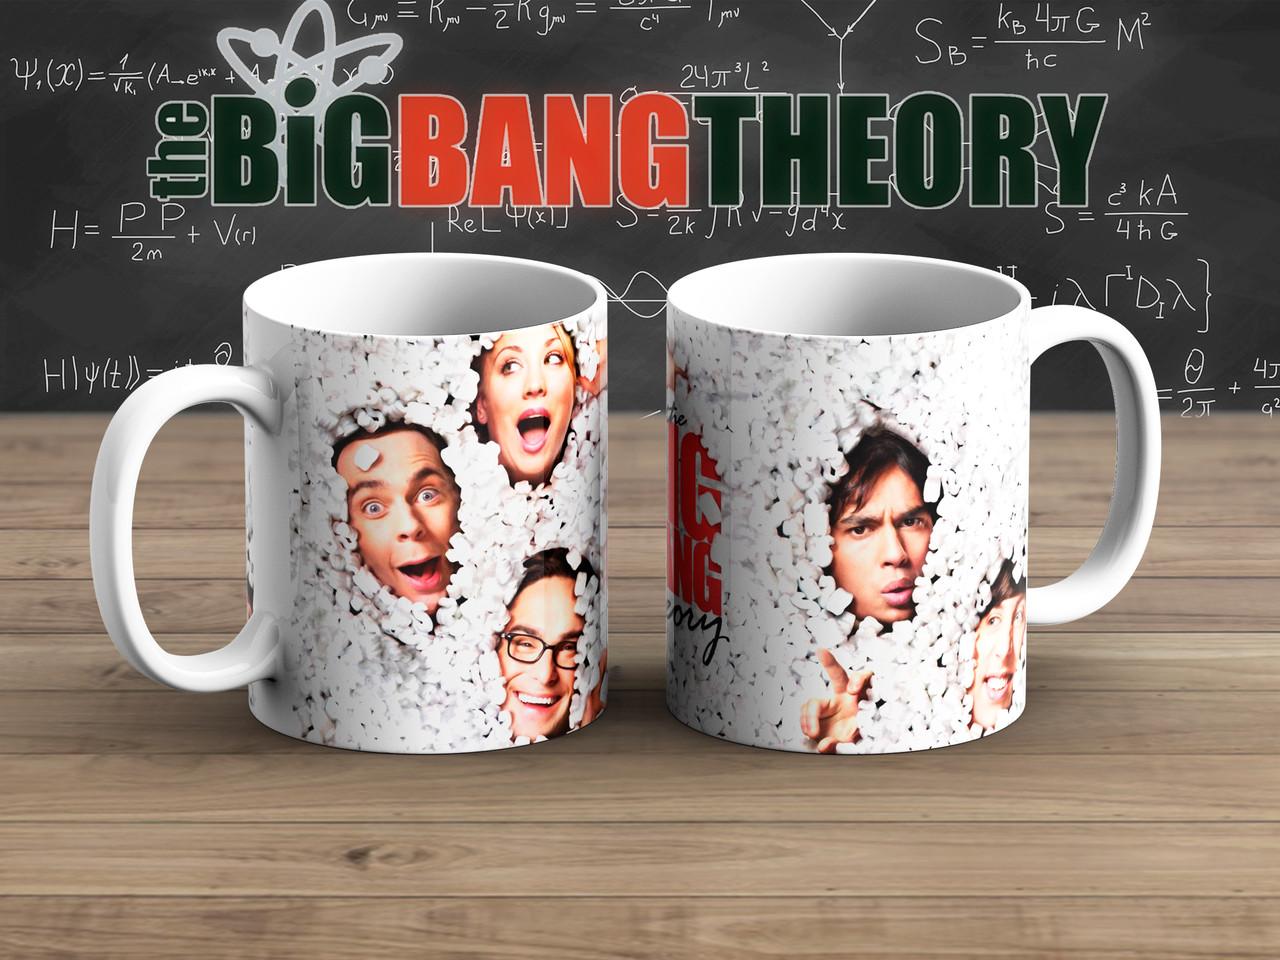 Чашка Лица Теория Большого взрыва / The Big Bang Theory